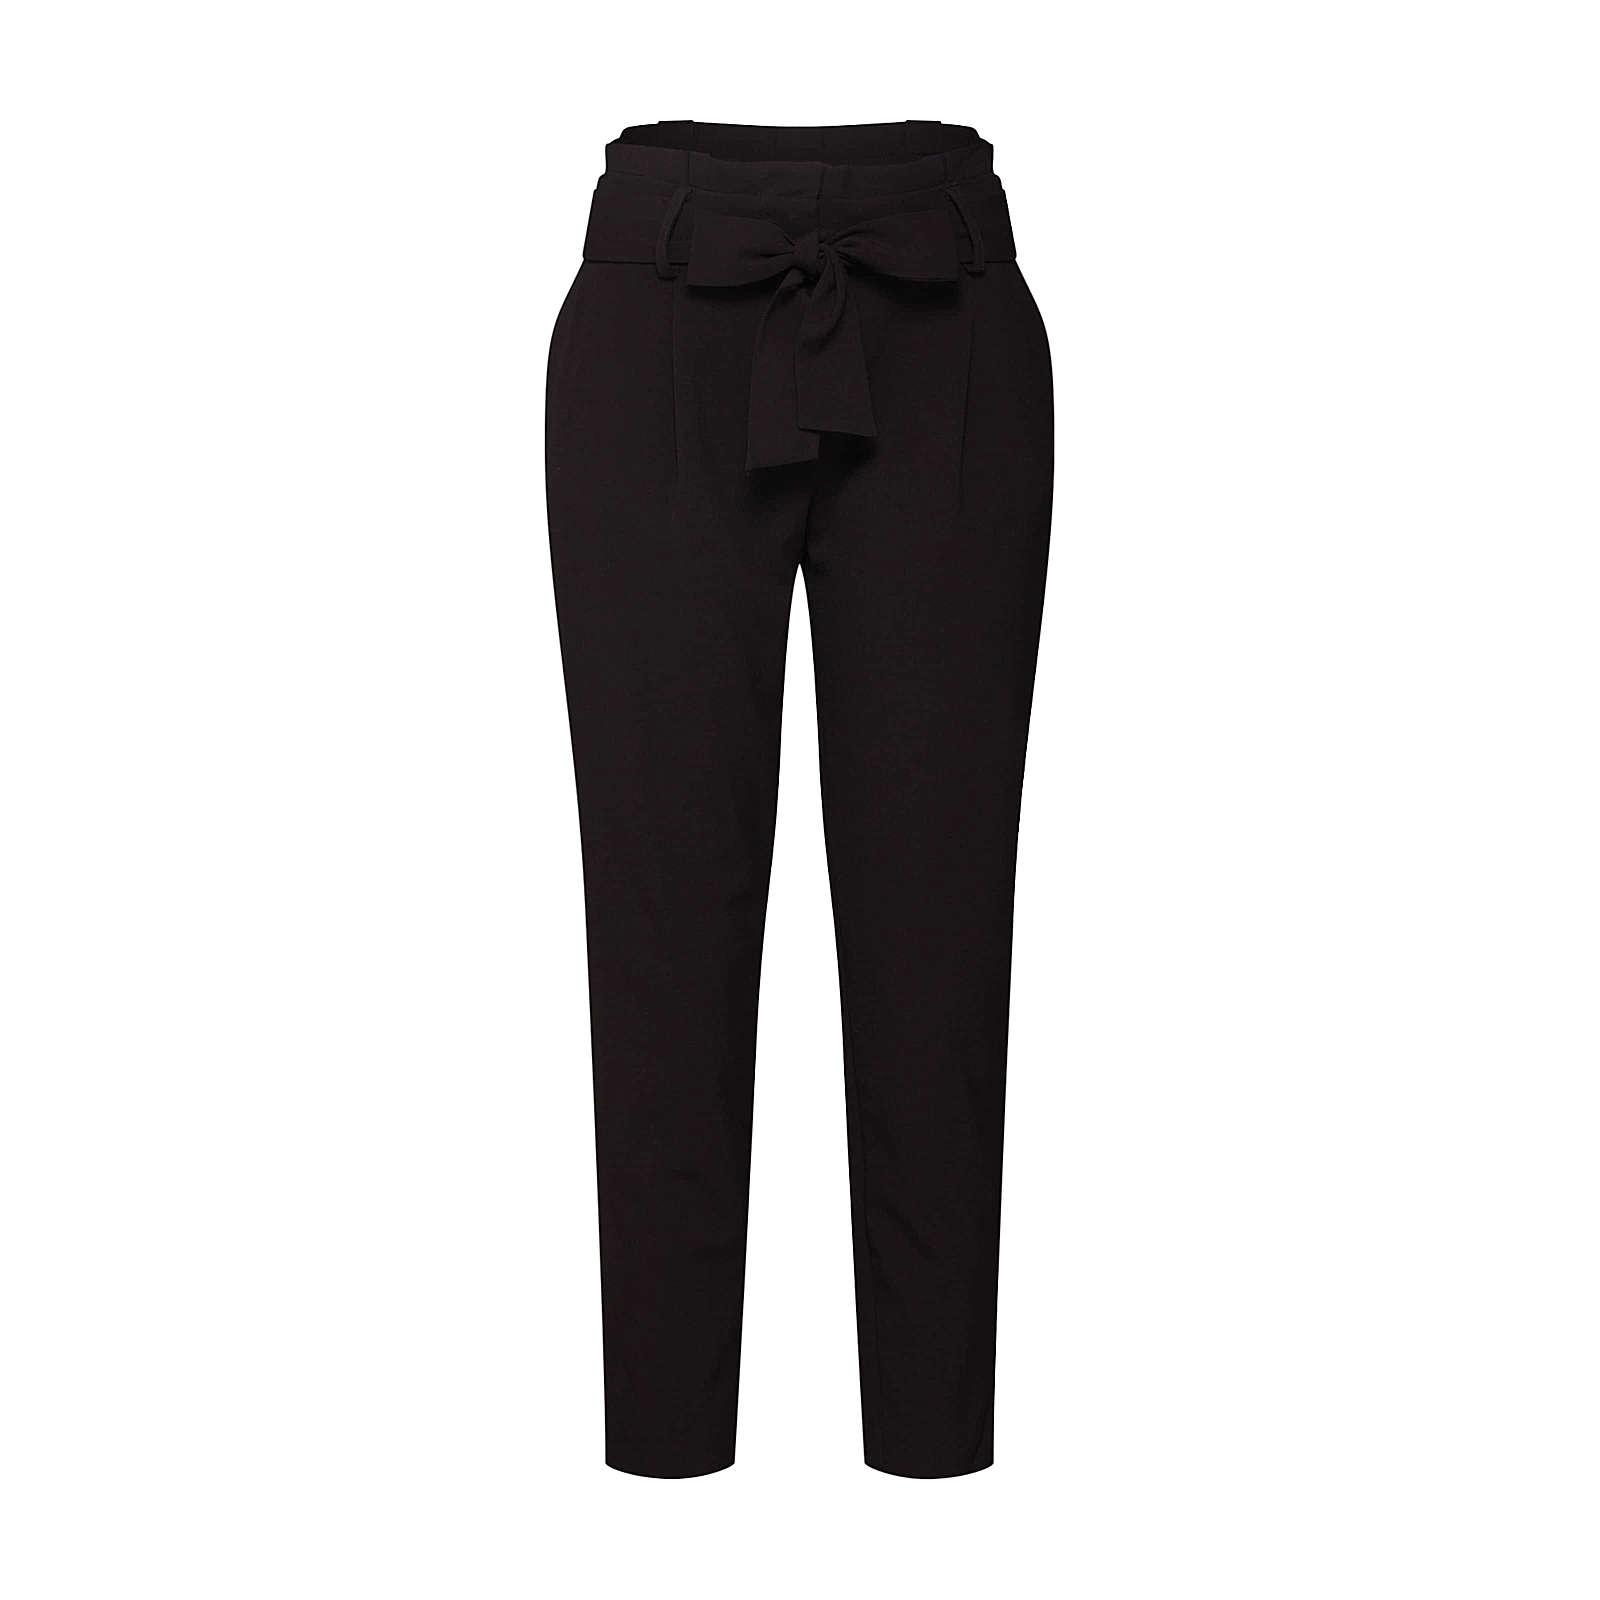 ONLY Bundfaltenhose FINI Stoffhosen schwarz Damen Gr. 36